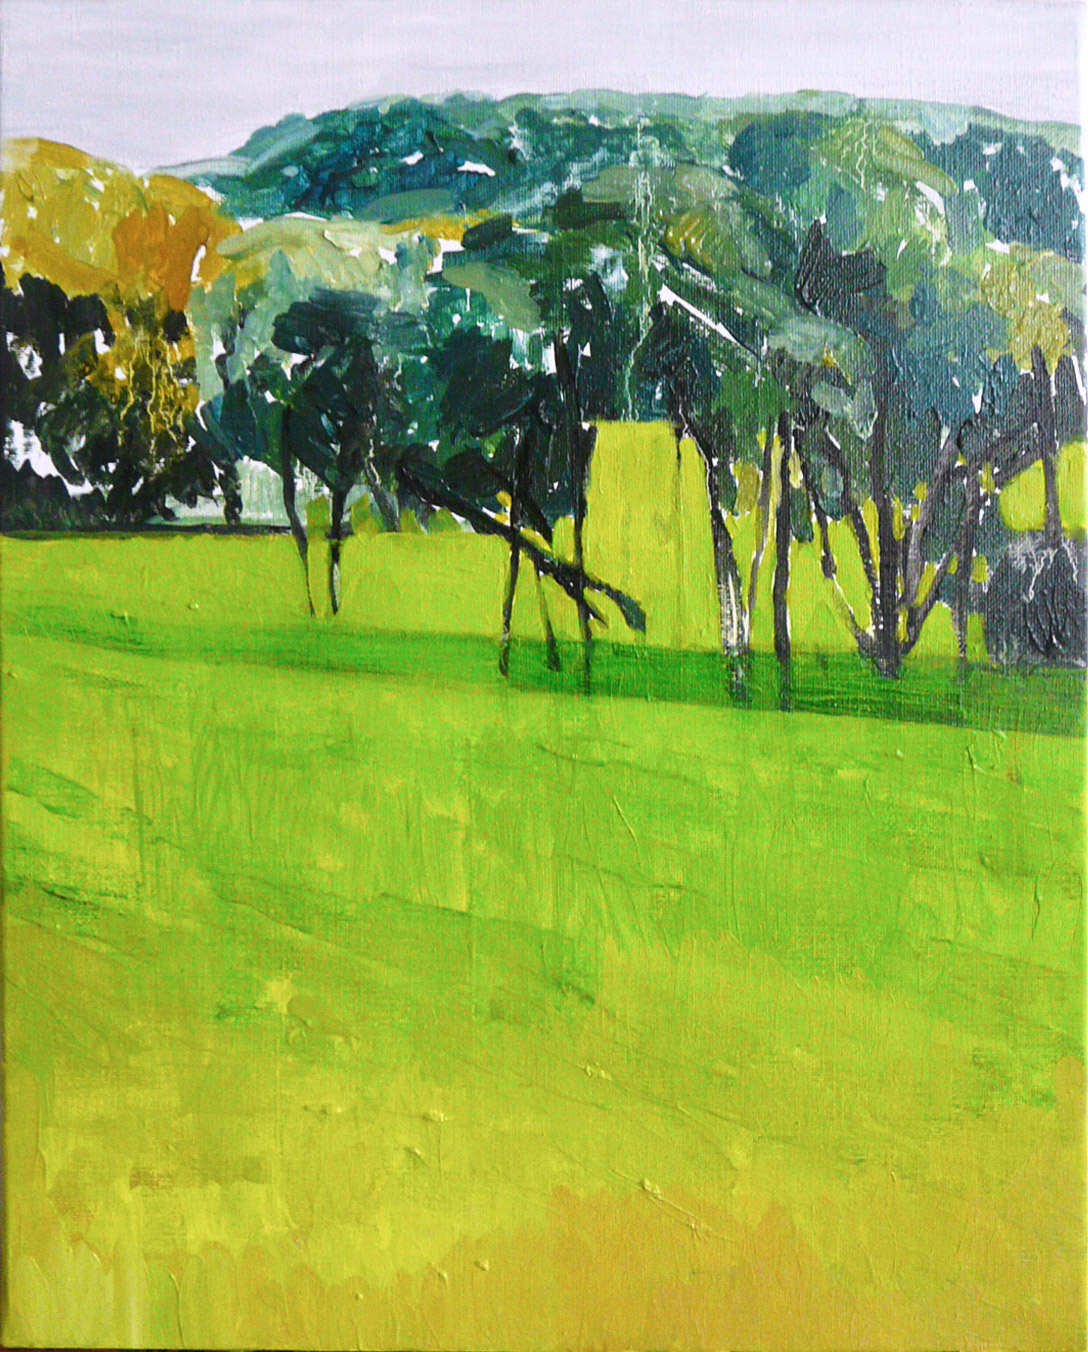 Meadow 1-3 2014 41cm x 33cm